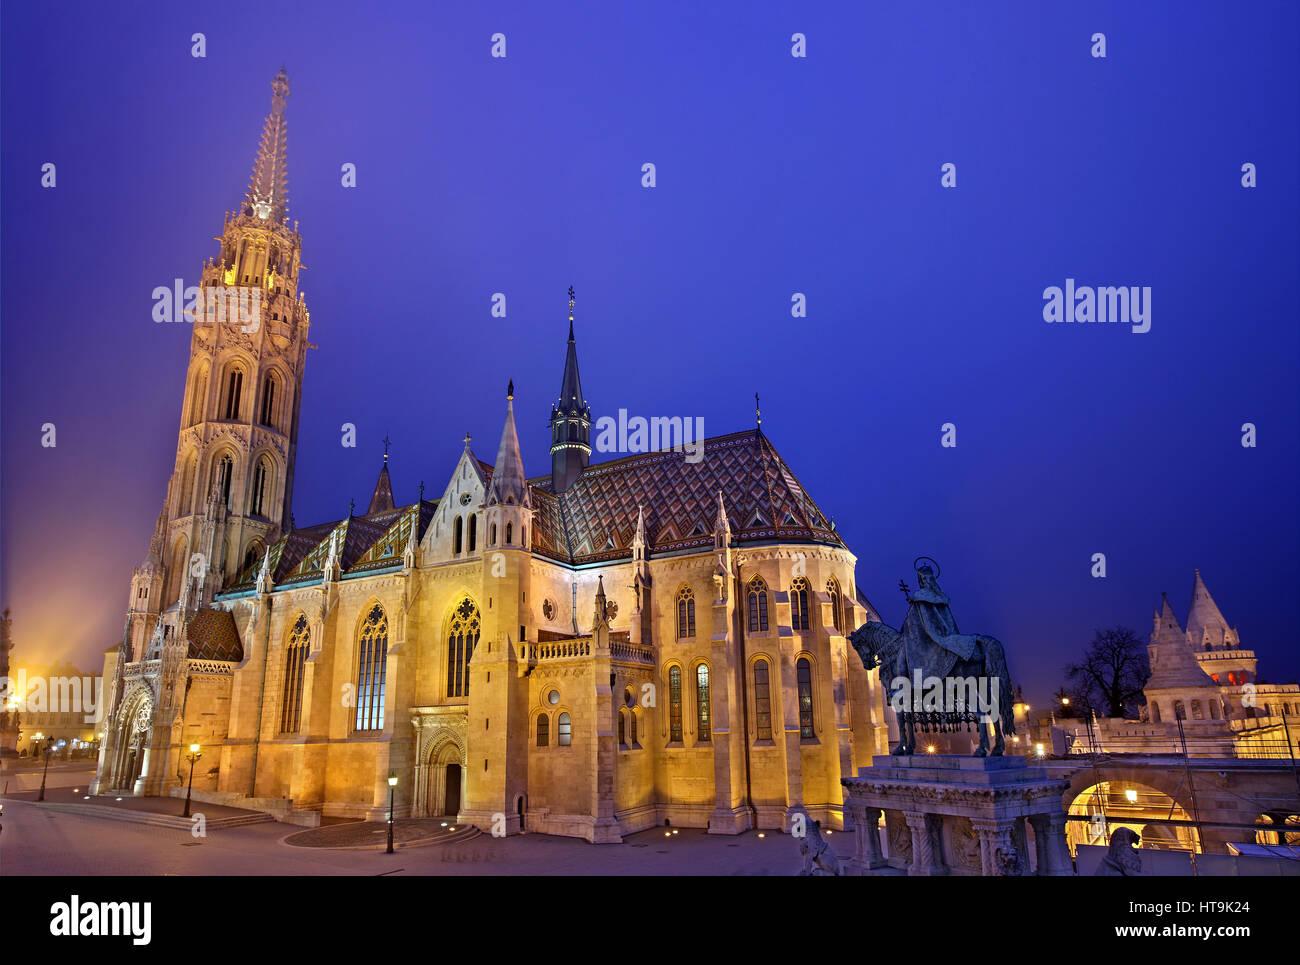 Matthias church (Matyas templom) and the 'Fisherman's Bastion', Castle Hill (Varhegy), Buda, Budapest, - Stock Image